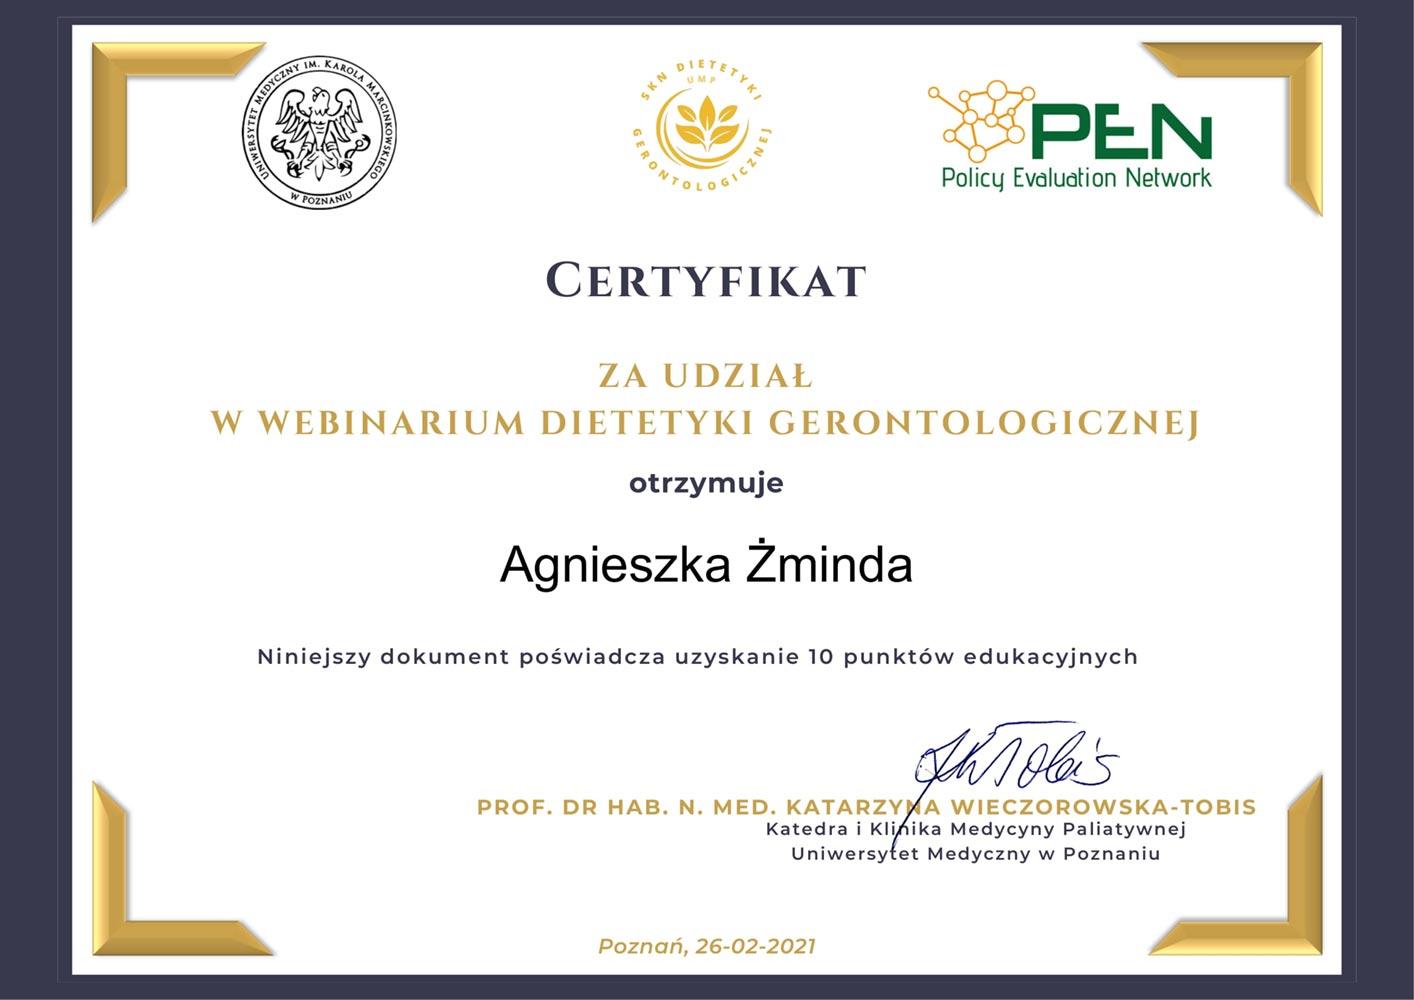 zminda agnieszka certyfikat uczestnik 305 1